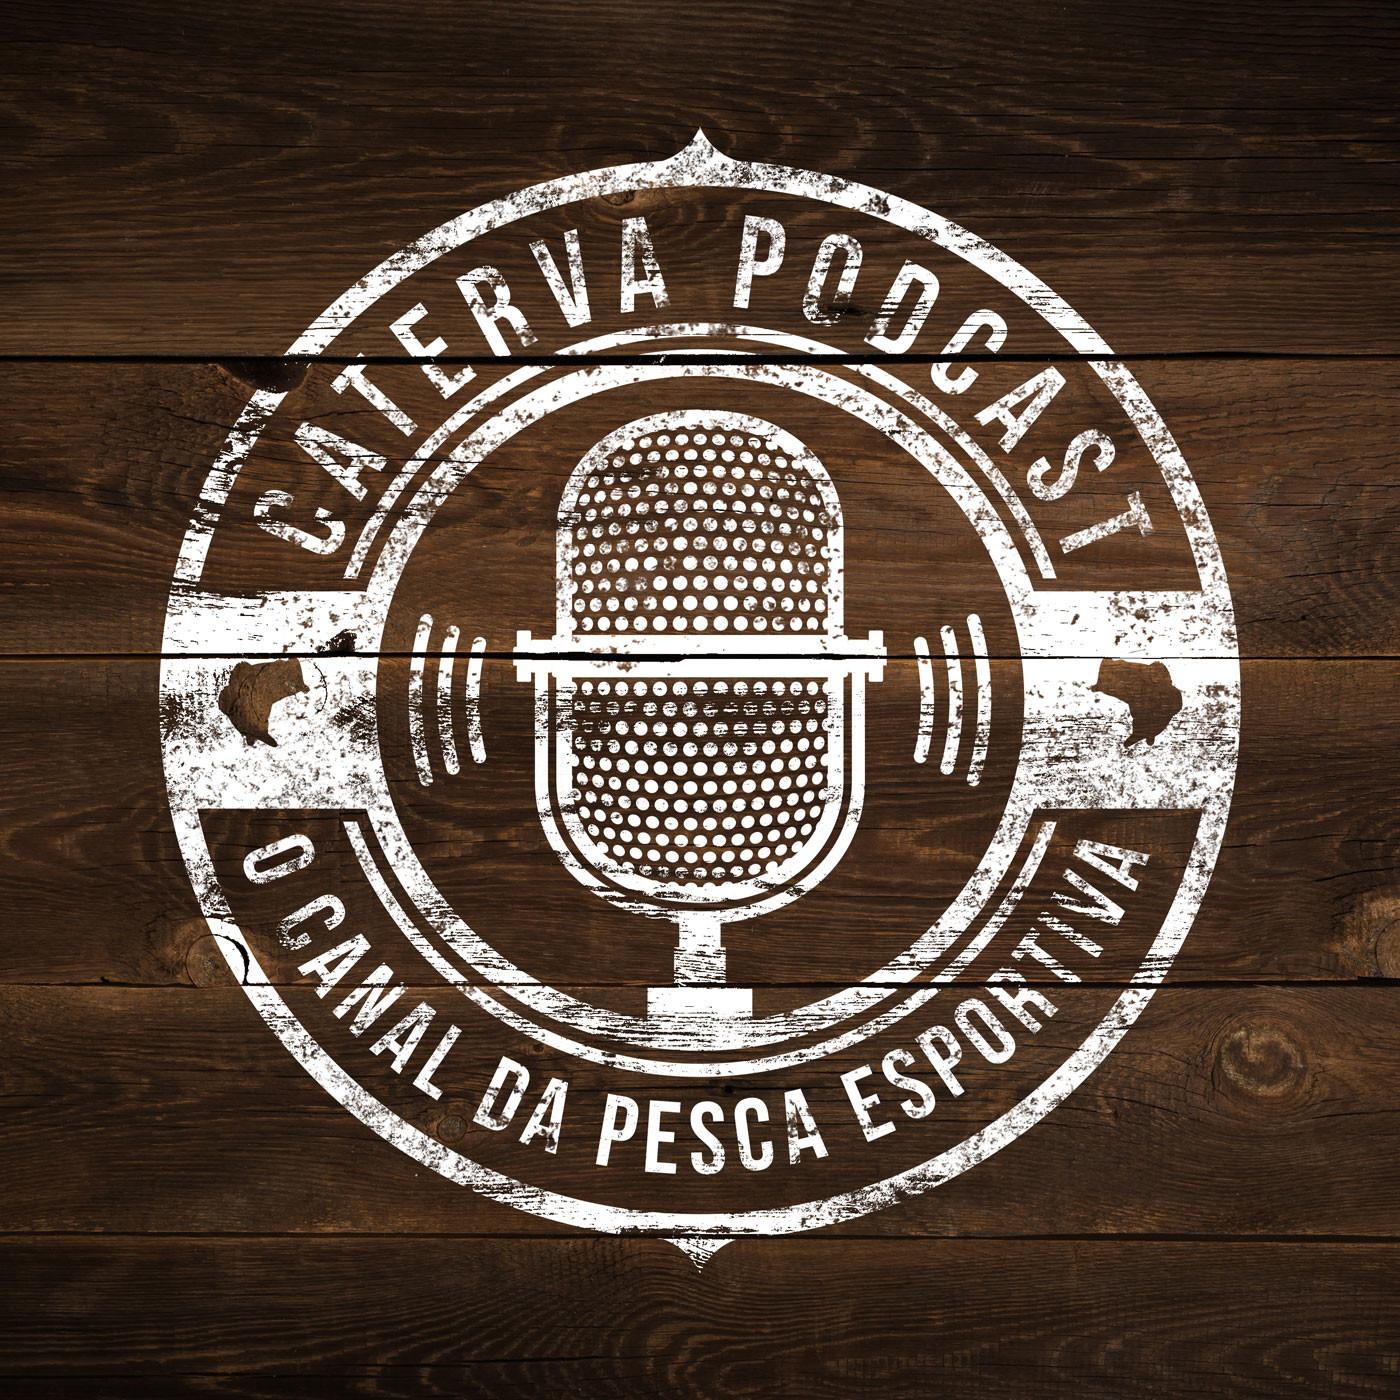 Caterva Podcast